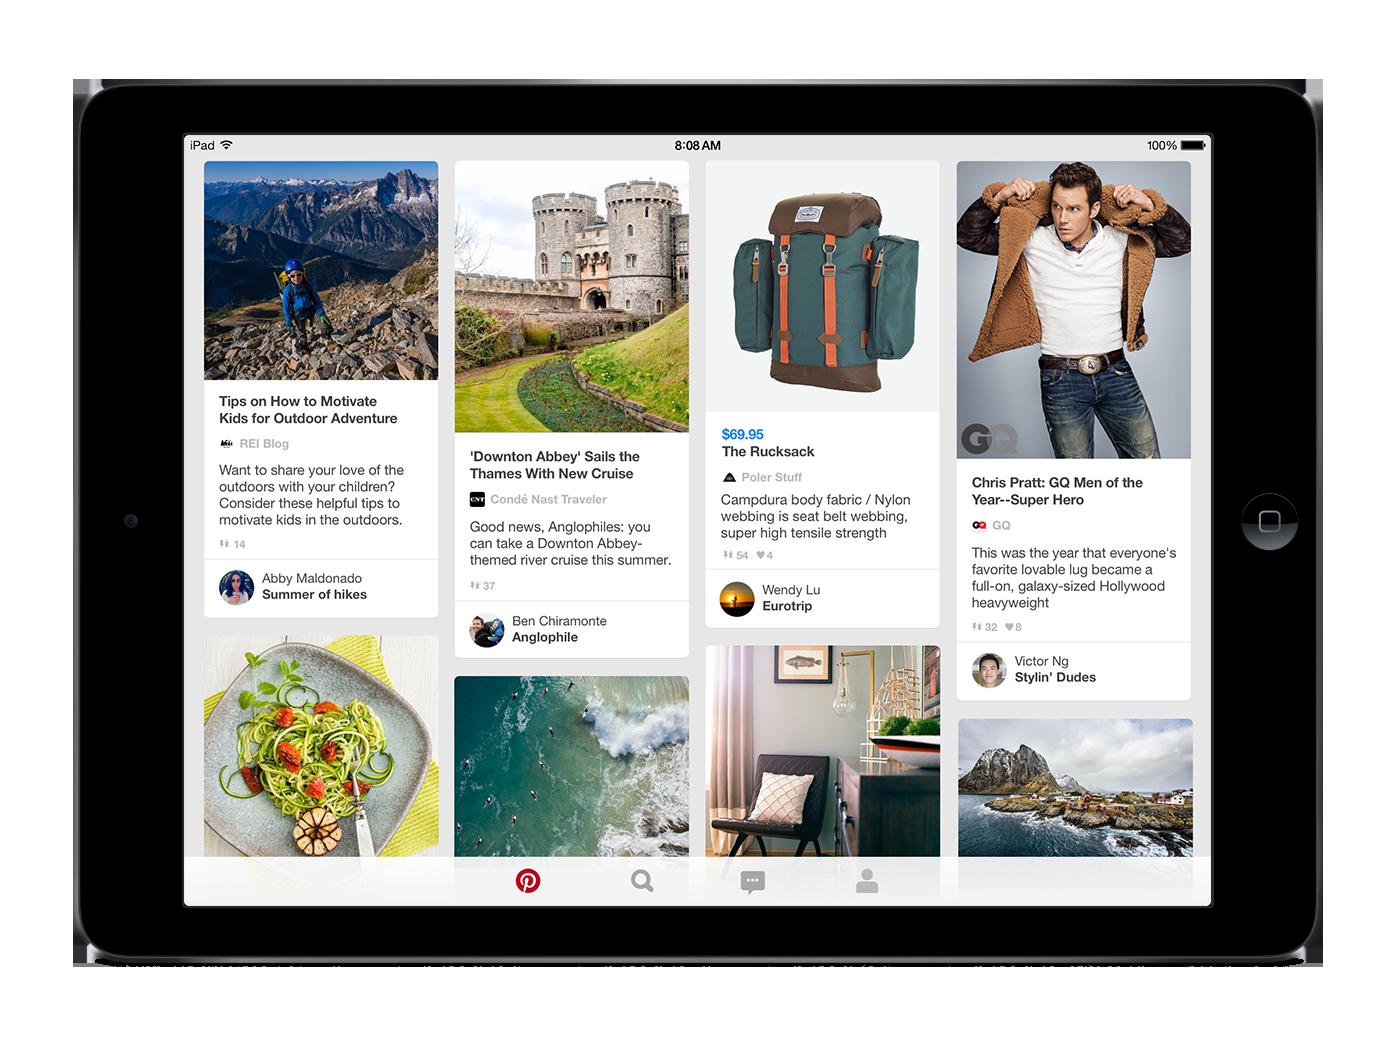 Pinterest home feed on an iPad.